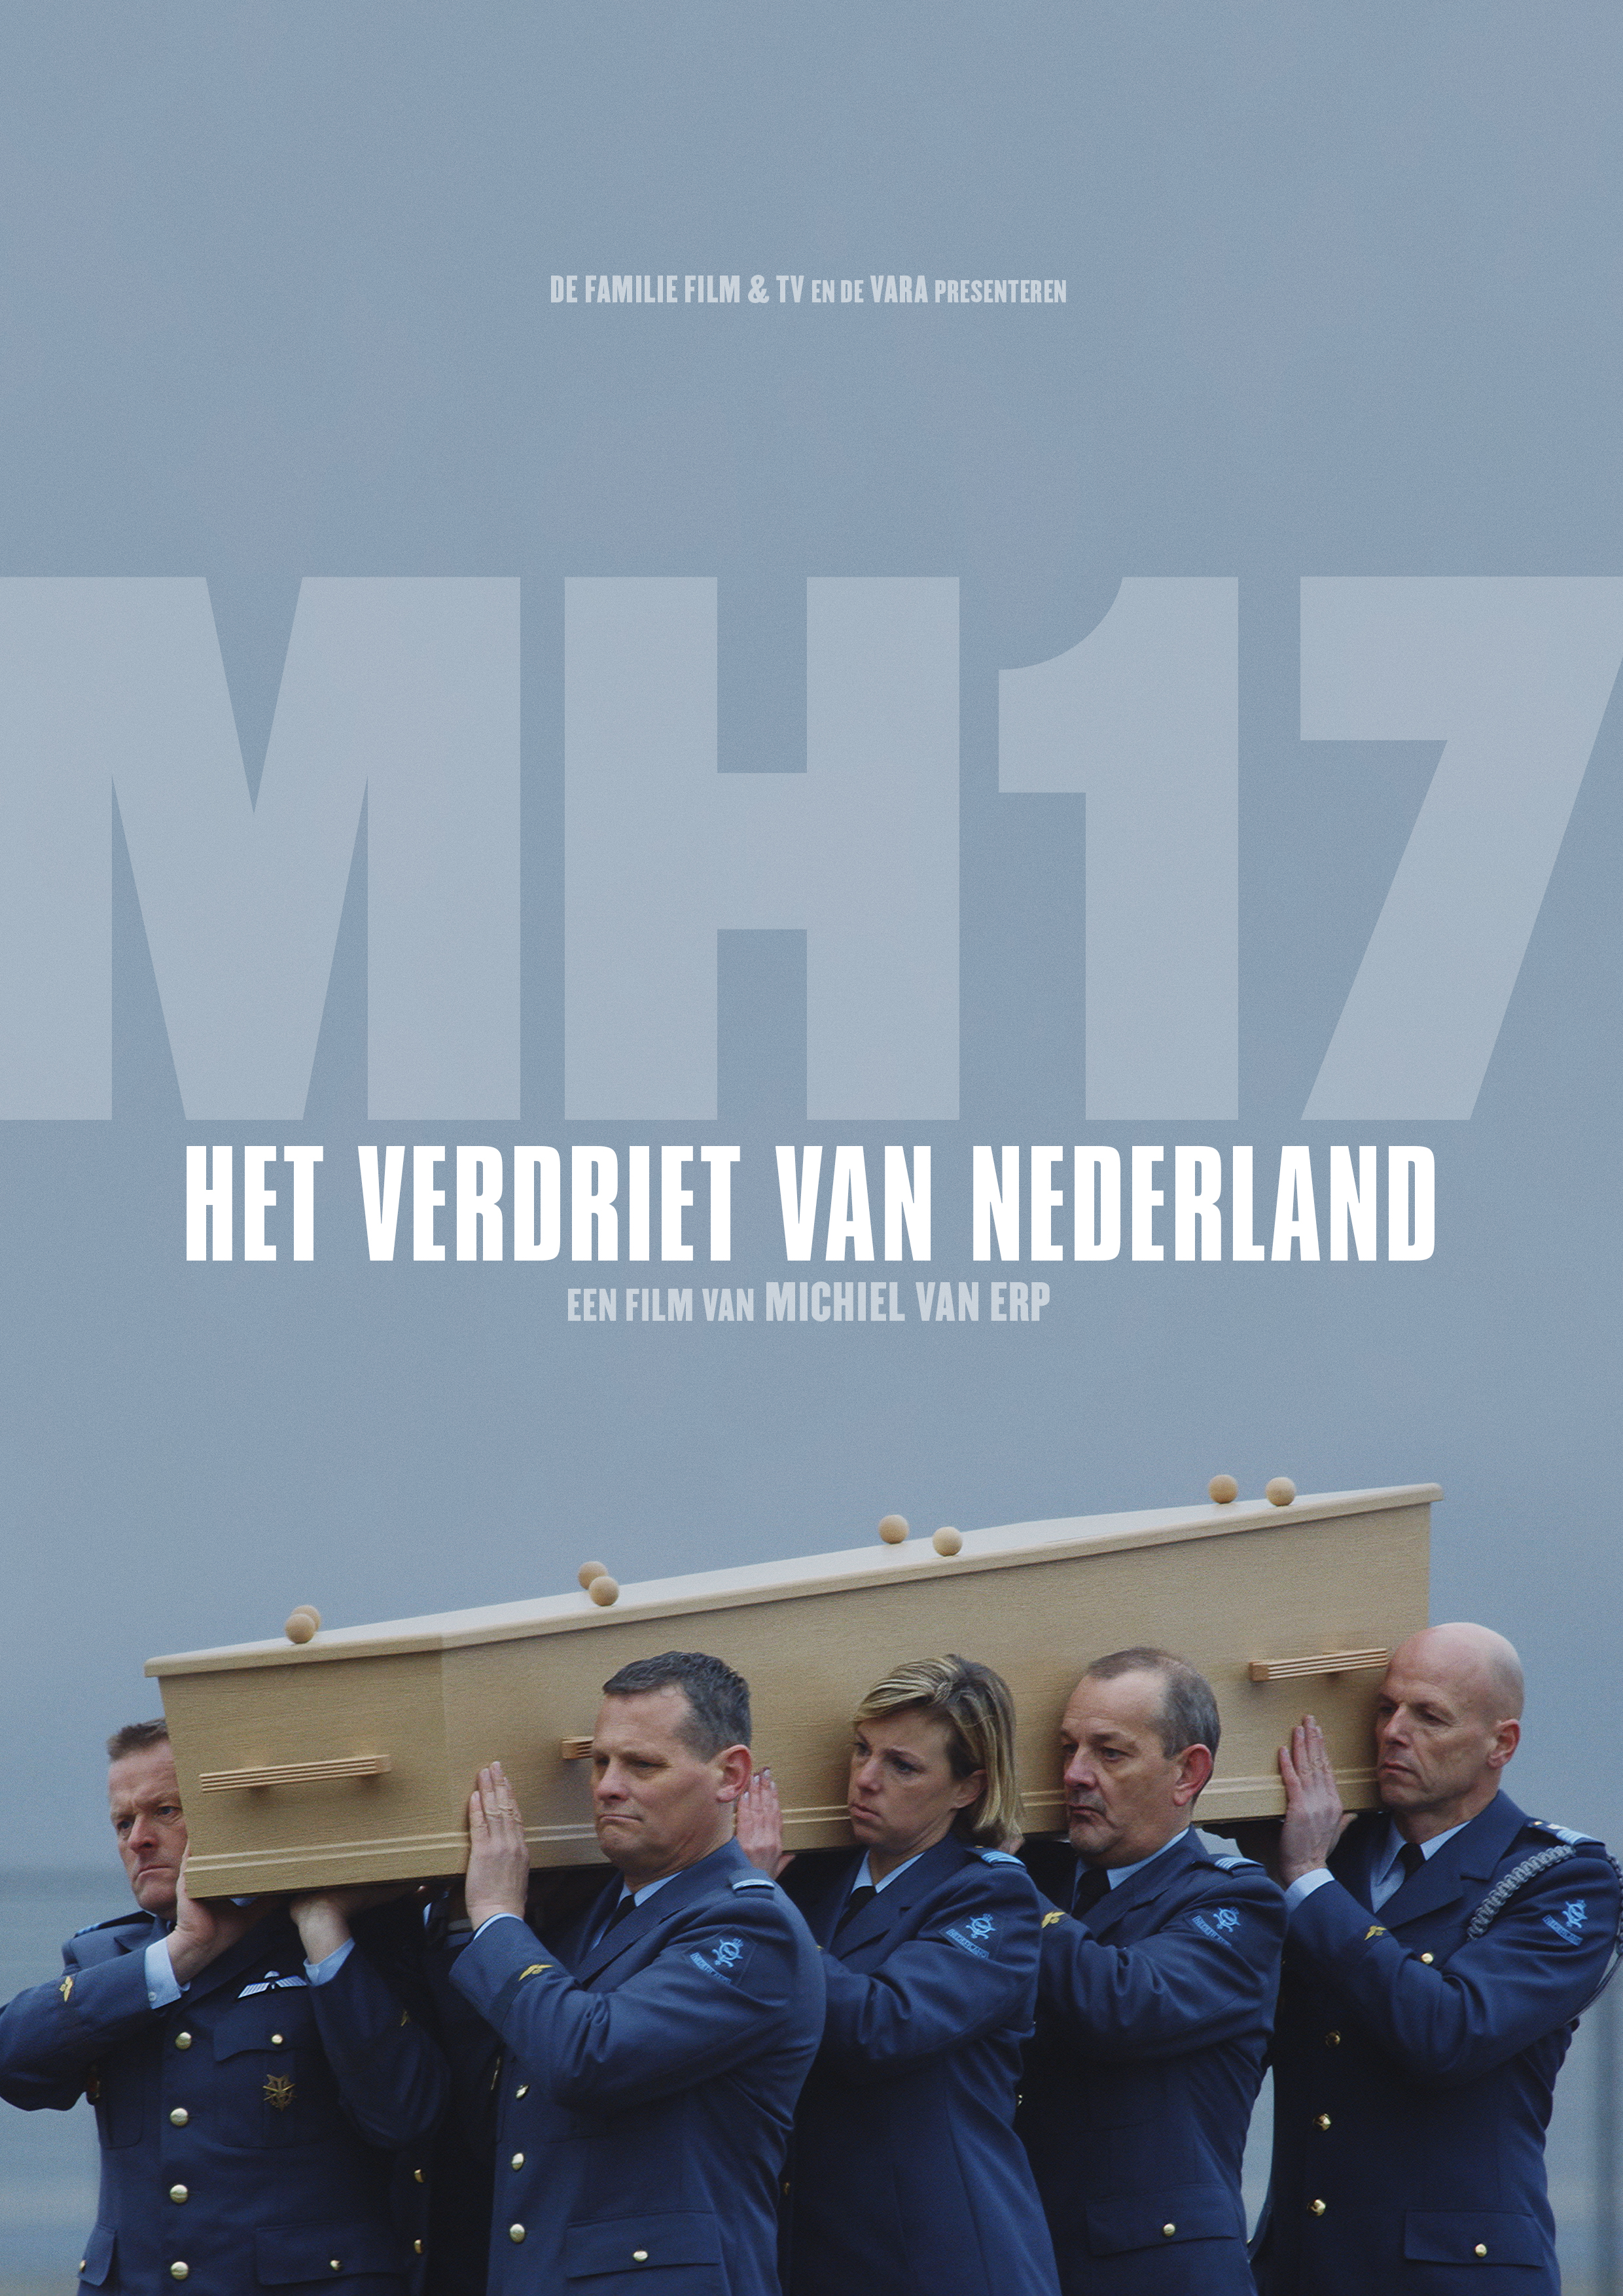 poster MH17-Het-verdriet-van-Nederland-RGB-A4-300dpi.jpg